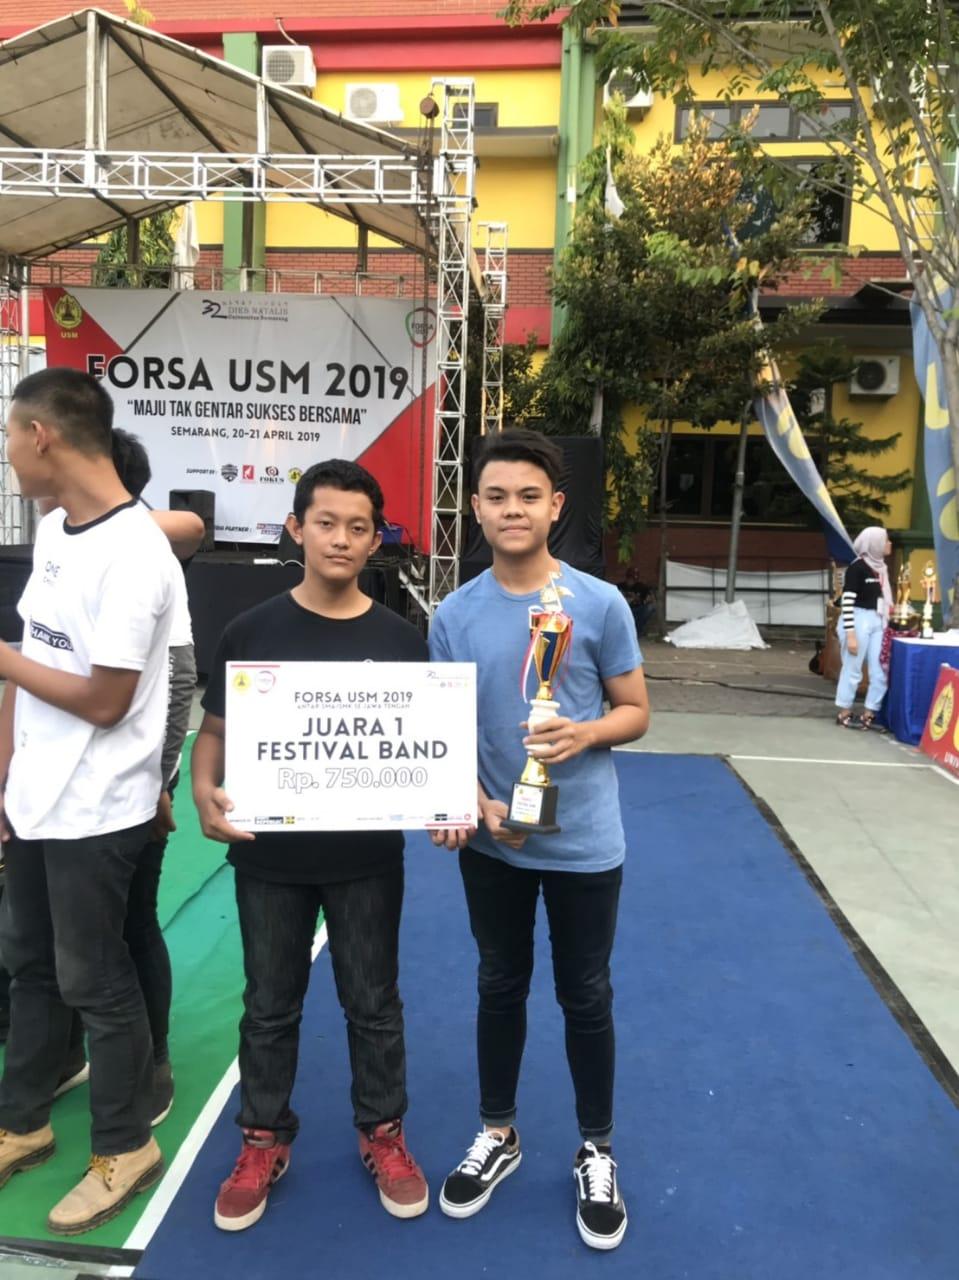 Forsa USM 2019, Blazend Band Smansa meraih juara 1 lomba band